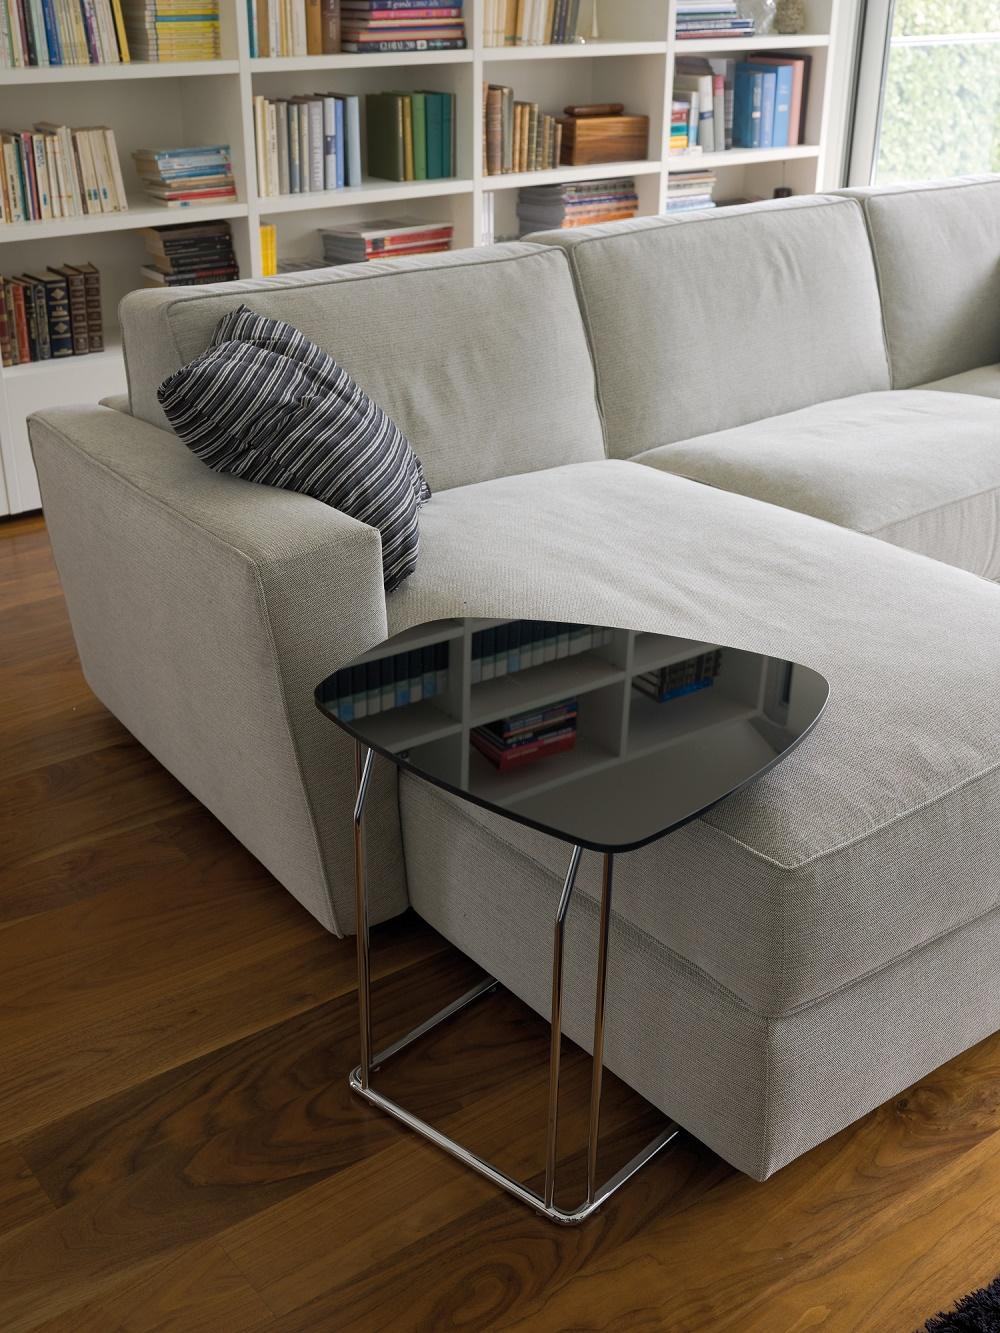 Canapés convertibles d'angle lit Shorter Angle Milano Bedding